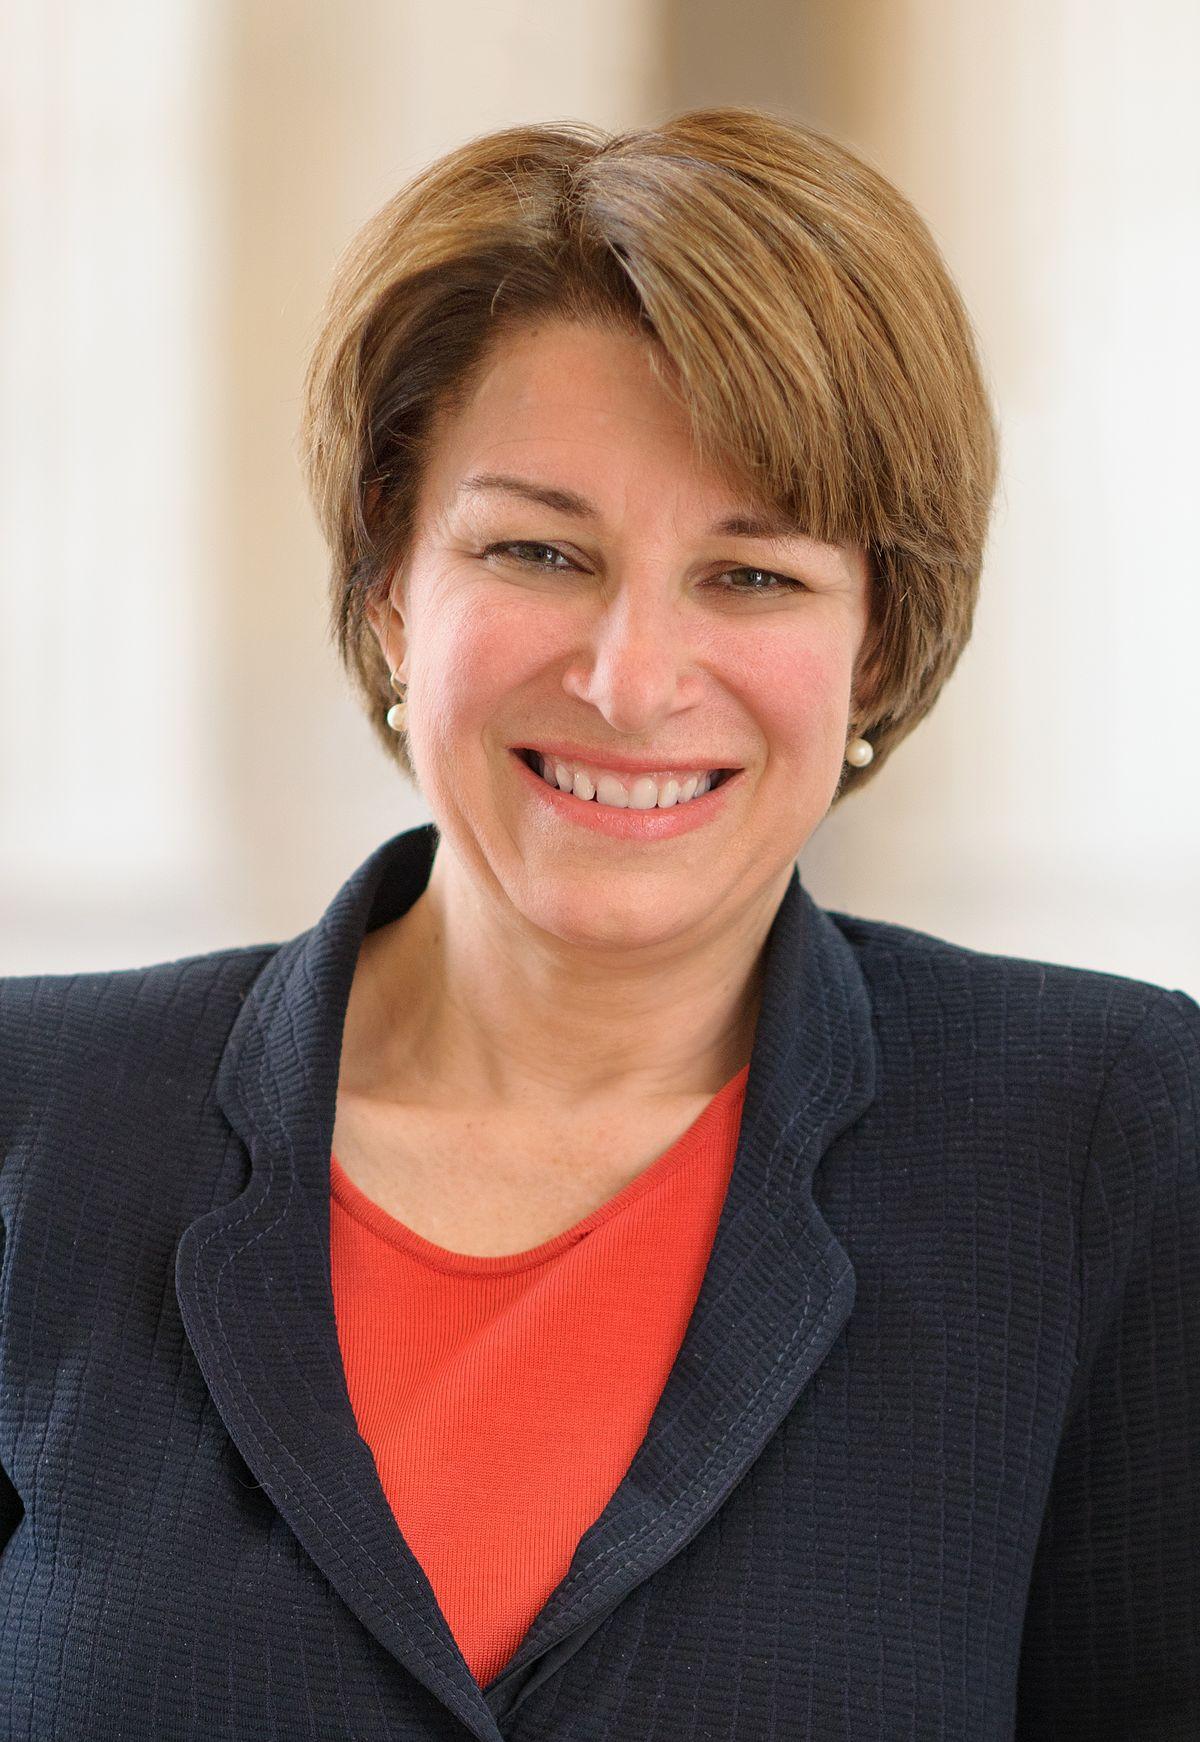 Amy Klobuchar – Wikipedia